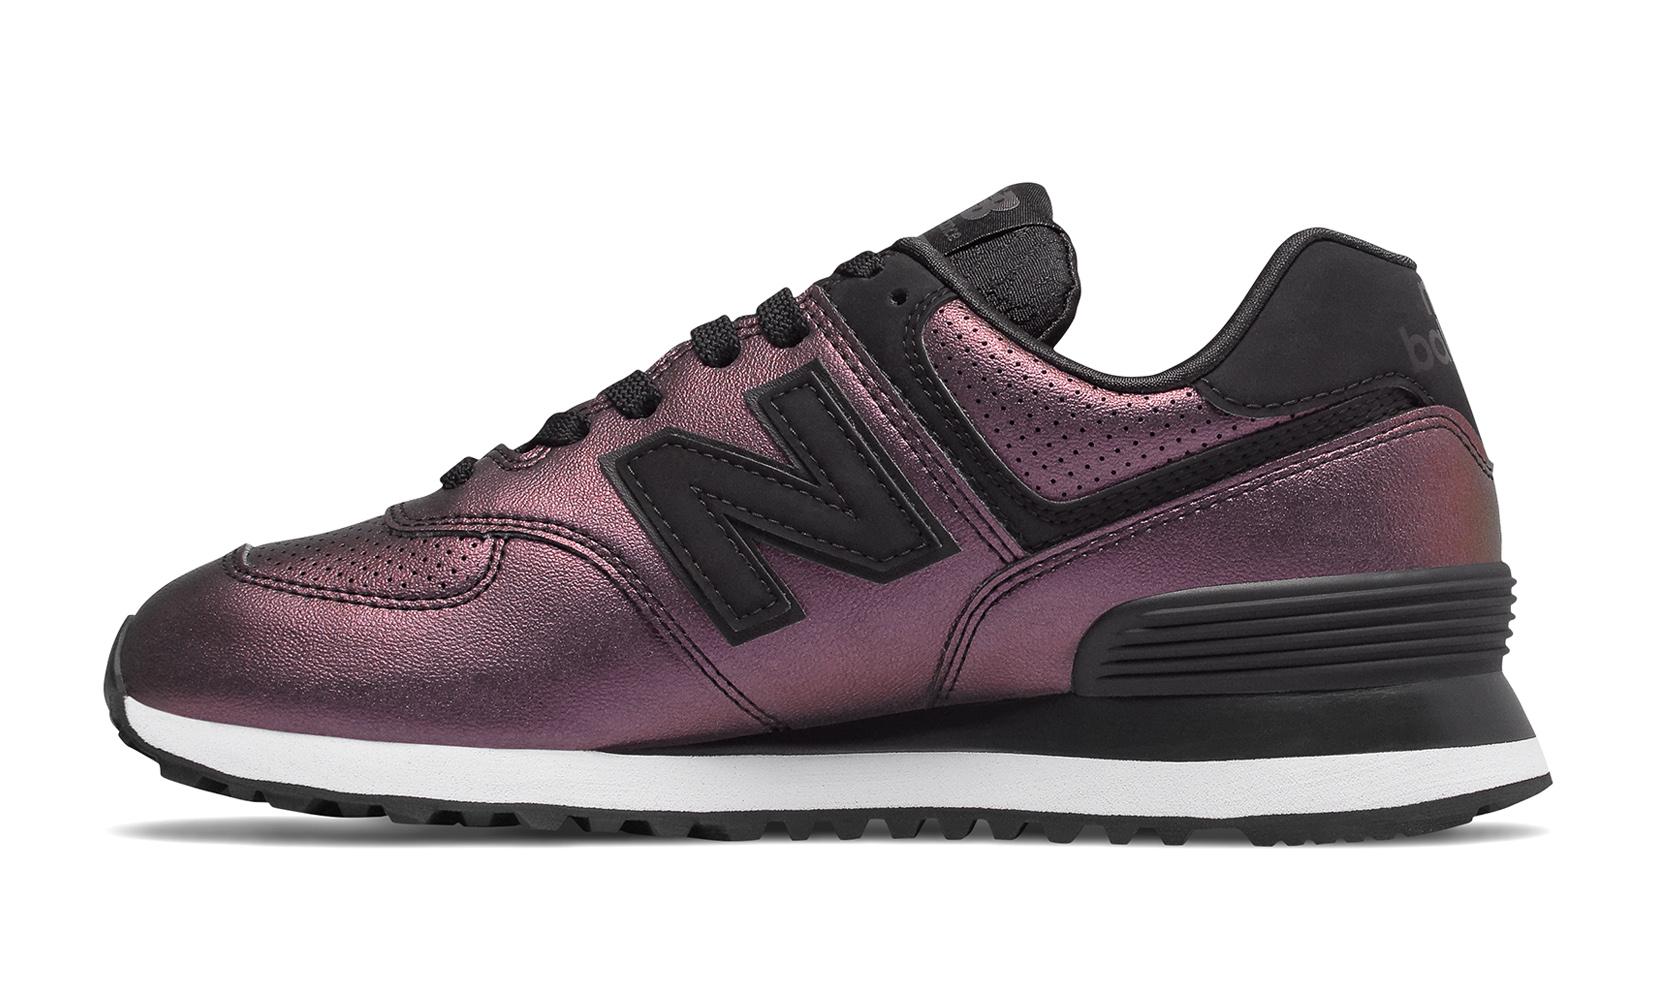 Жіноче взуття повсякденне 574 Sheen Pack WL574KSB | New Balance